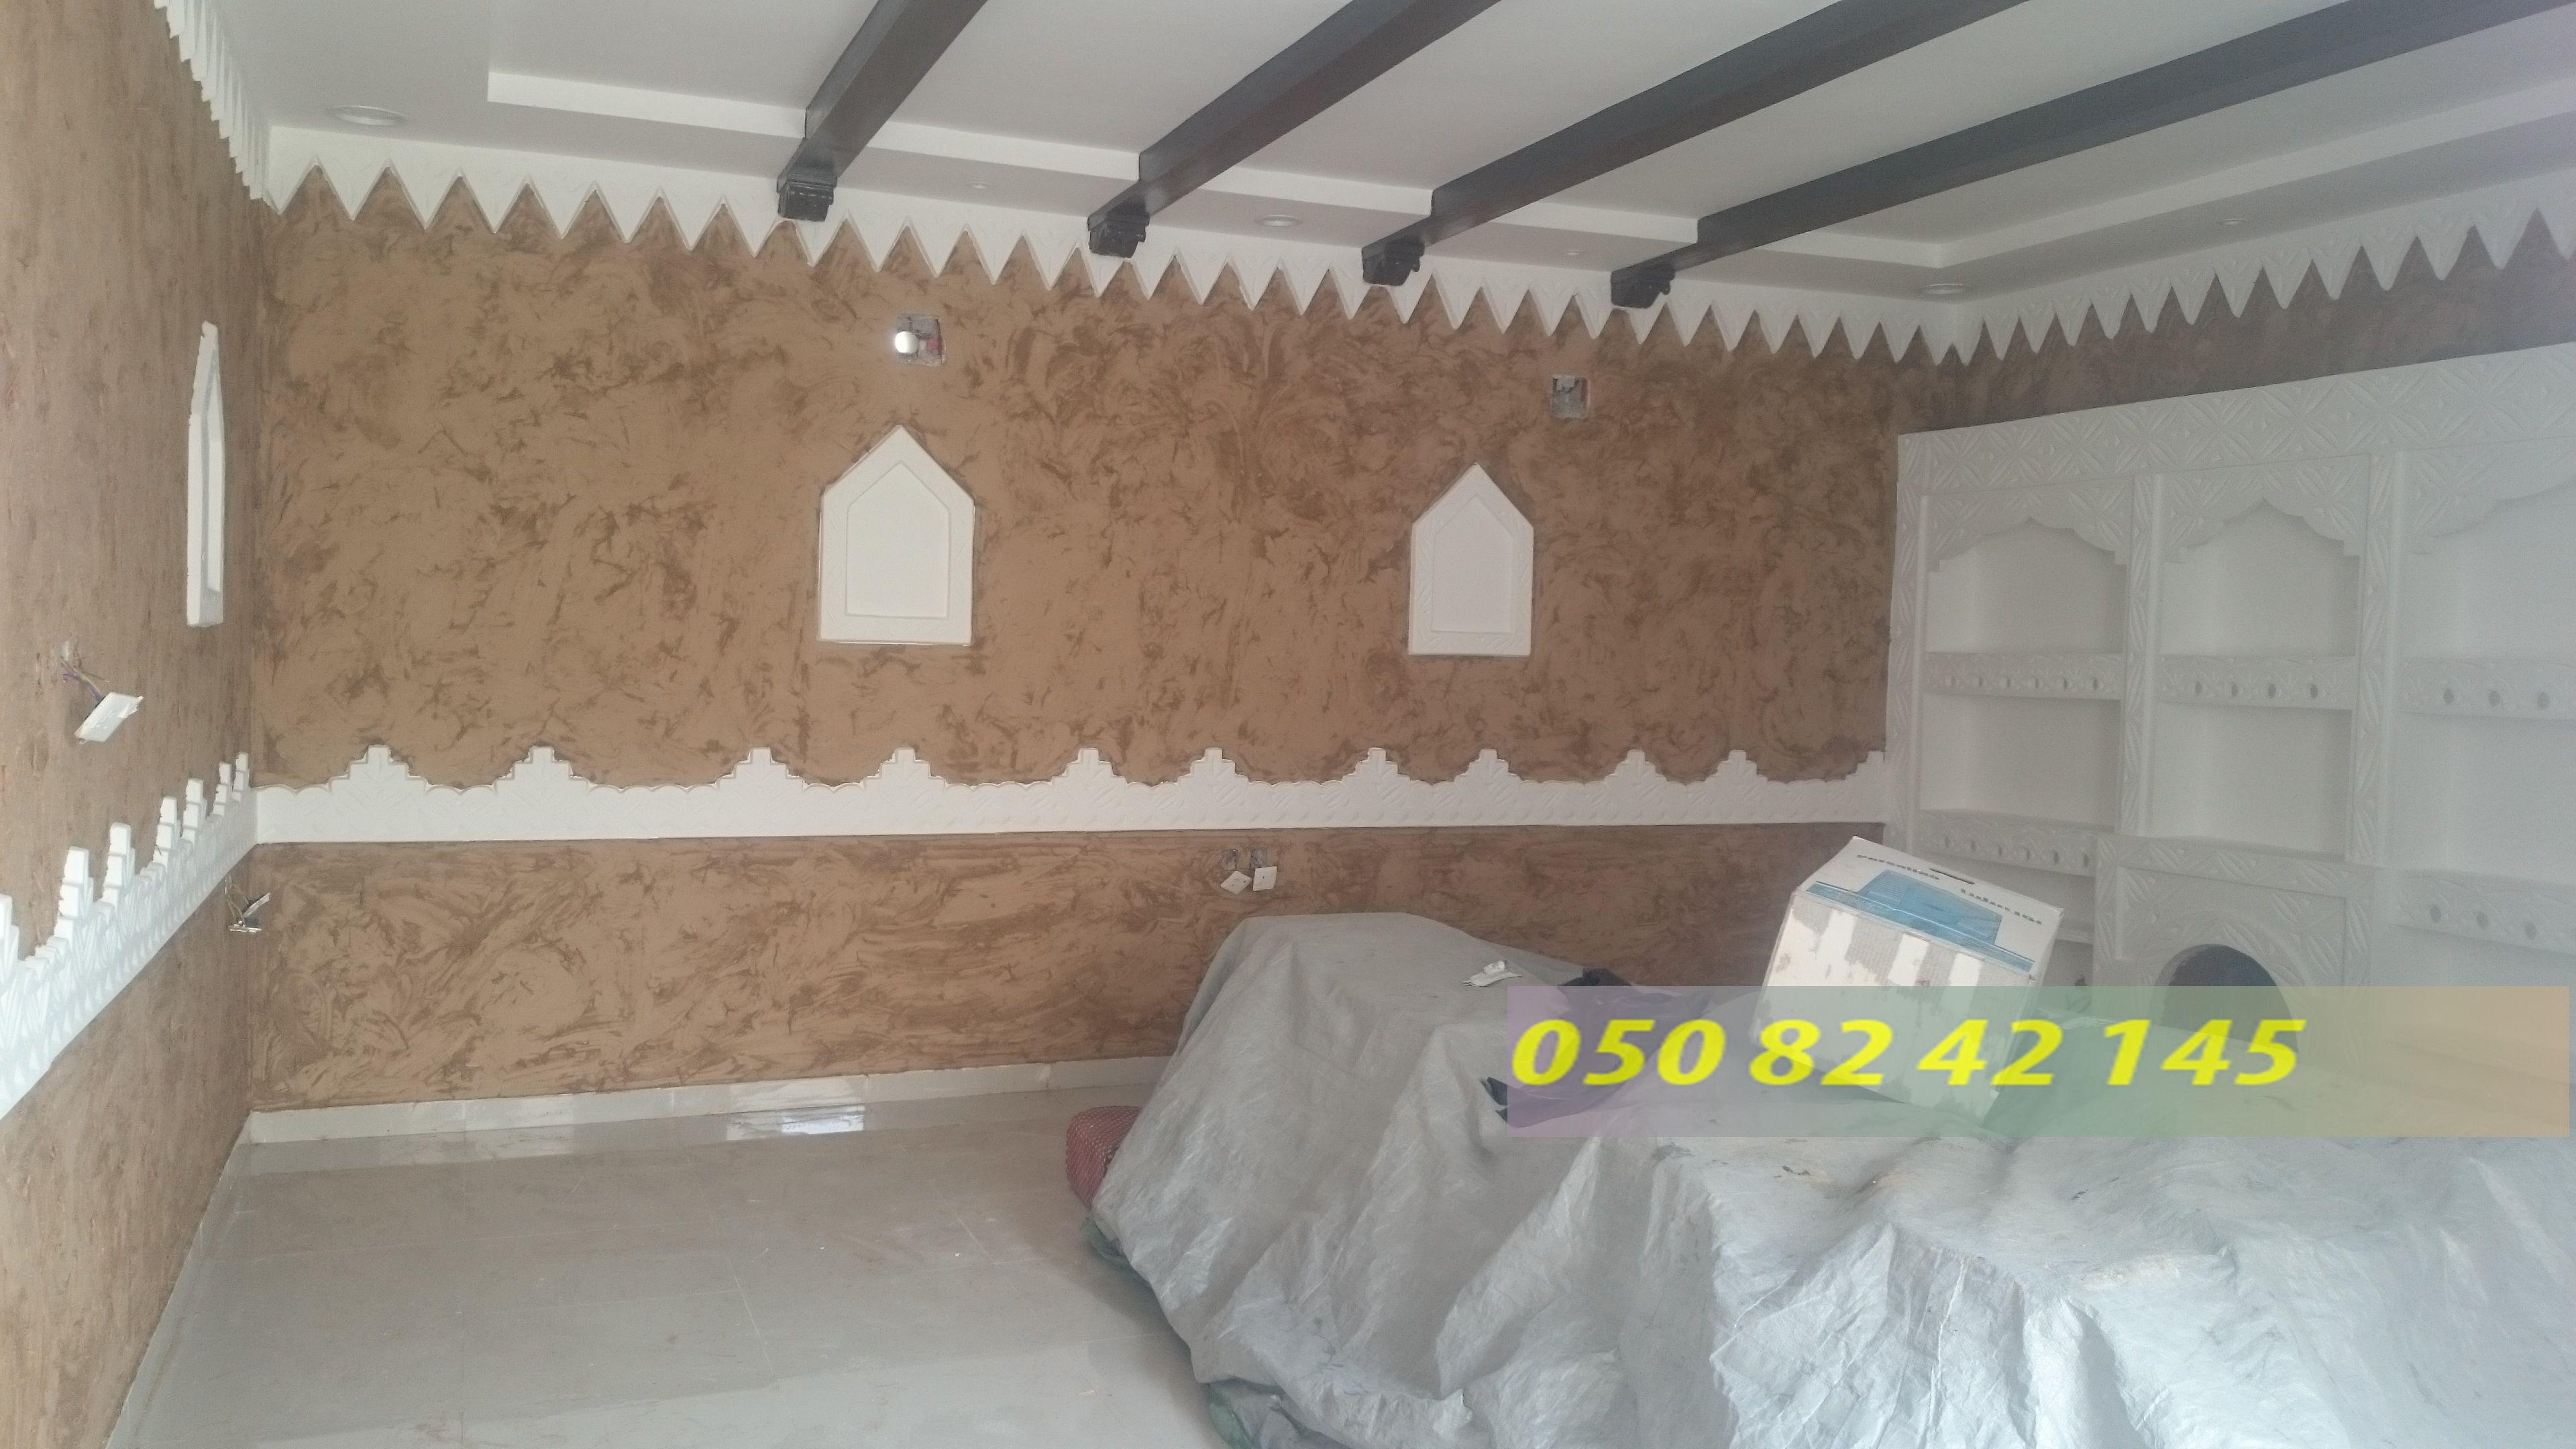 تراث مجالس تراثيه غرف تراثيه مجالس شعبيه مشب تراثي مشبات تراثيه Valance Curtains Decor Loft Bed